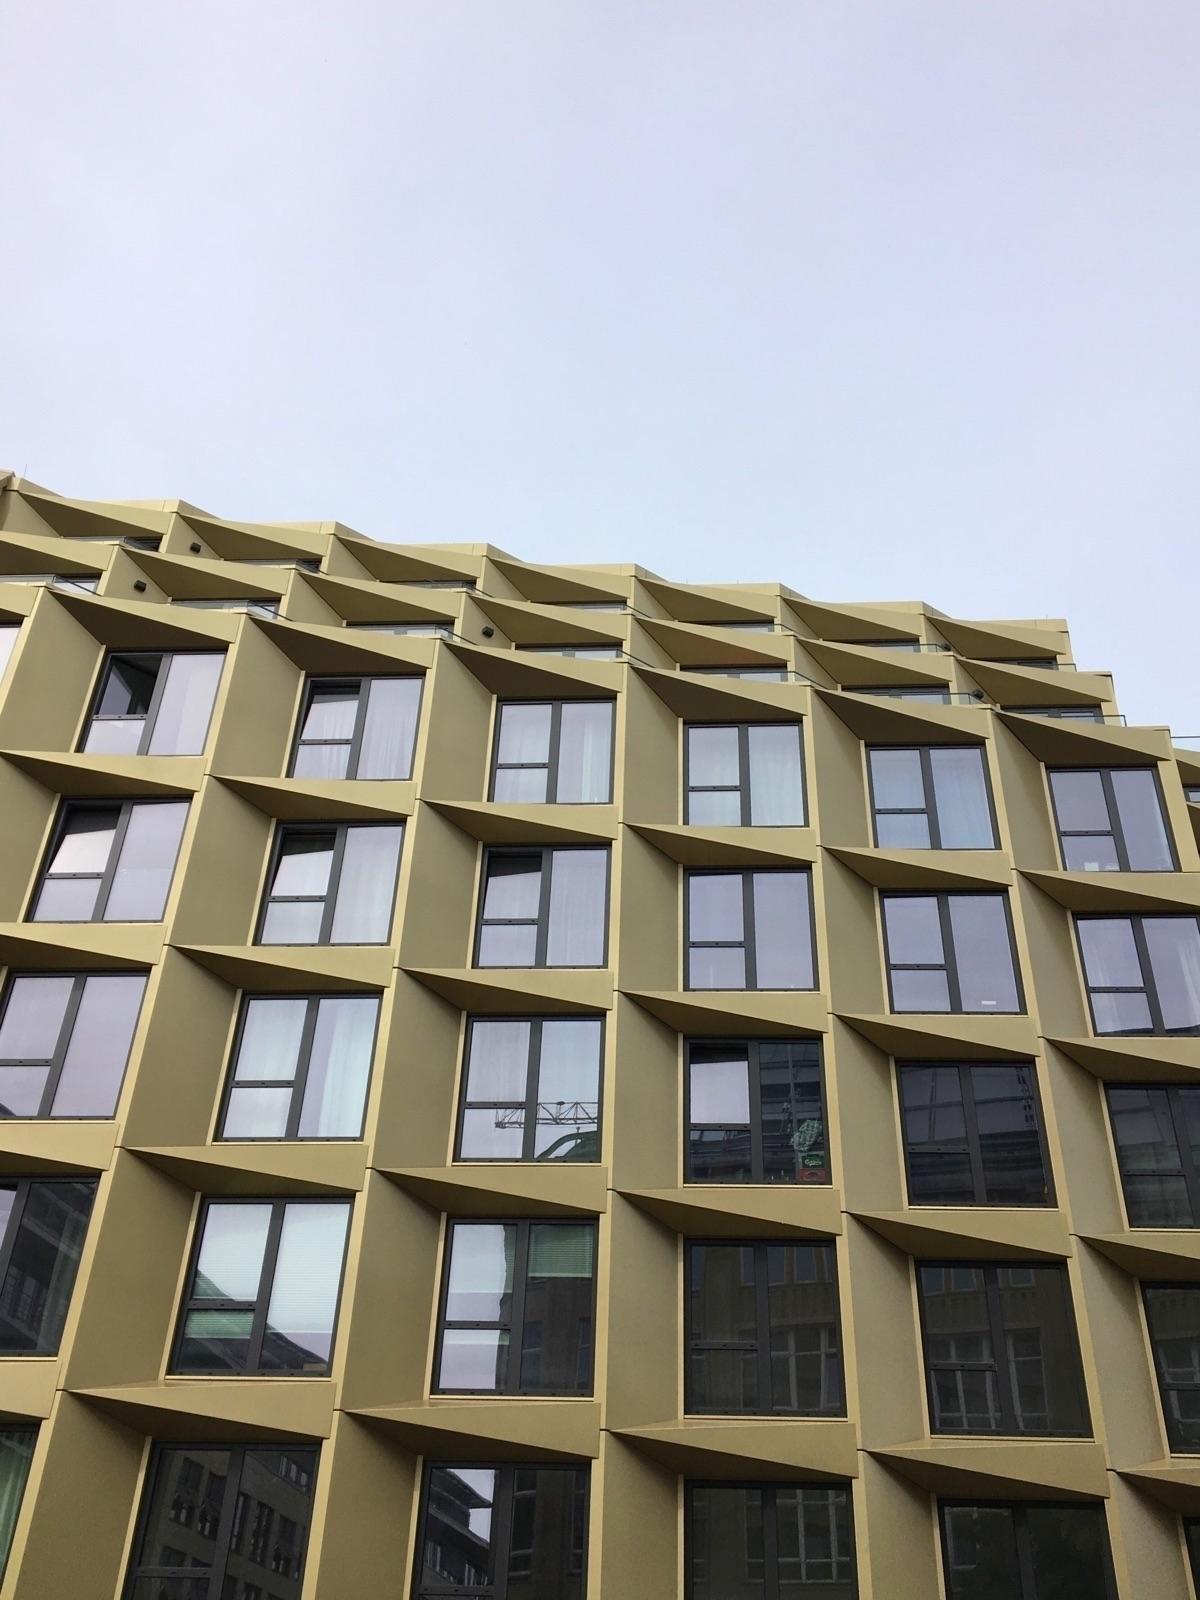 Cool/Random Apartment Building  - rowiro | ello